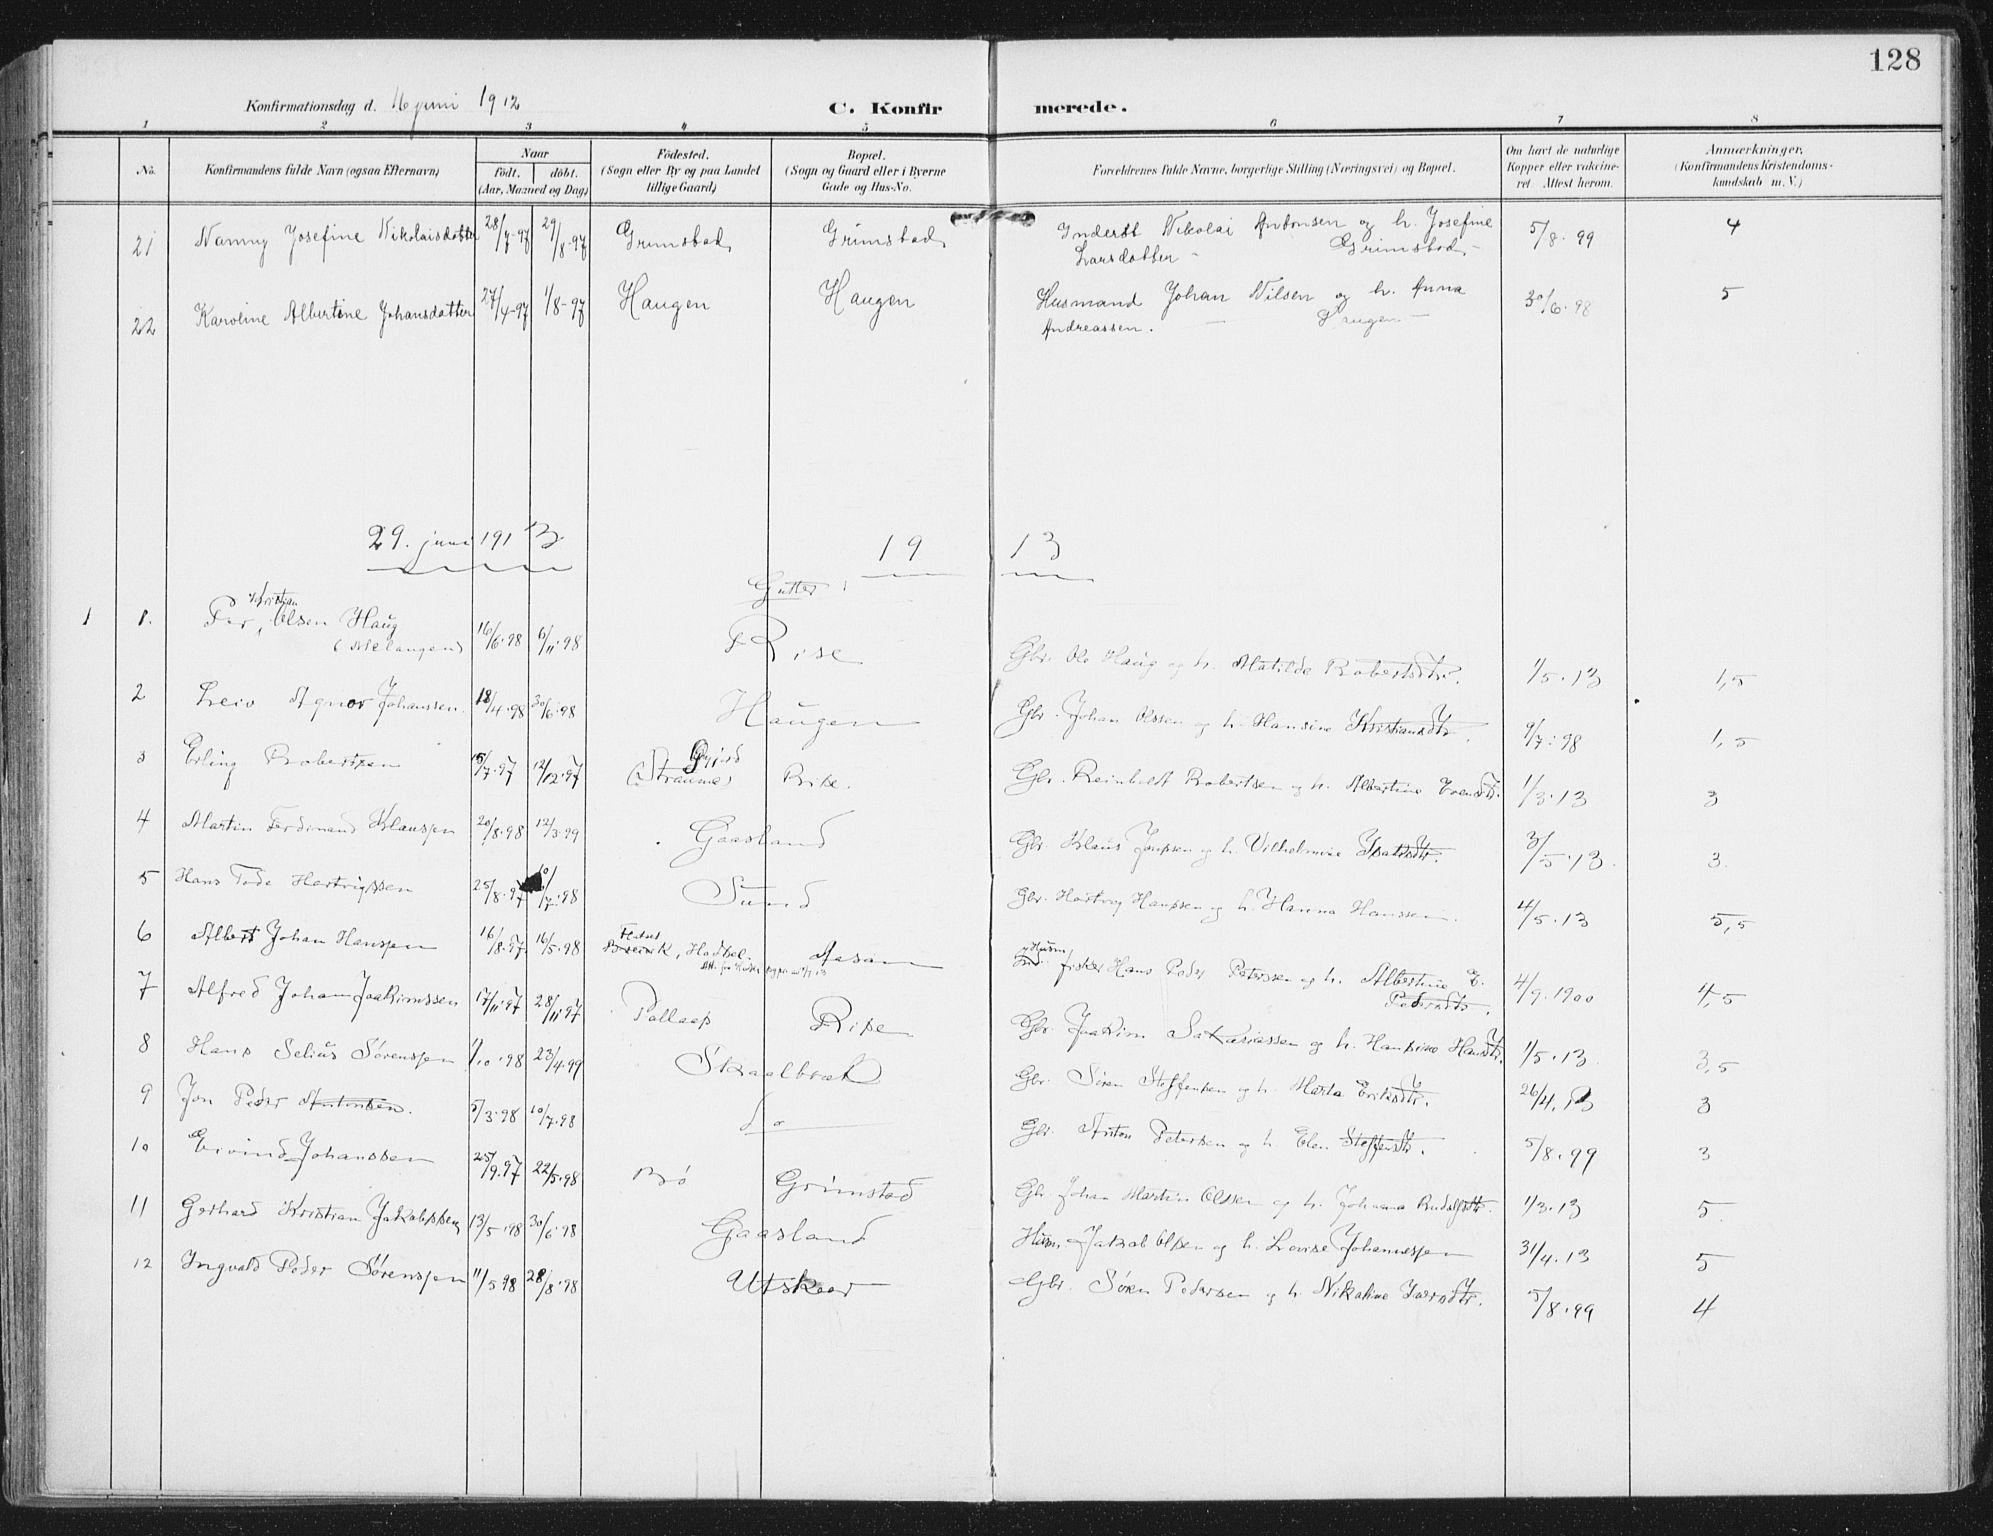 SAT, Ministerialprotokoller, klokkerbøker og fødselsregistre - Nordland, 892/L1321: Ministerialbok nr. 892A02, 1902-1918, s. 128